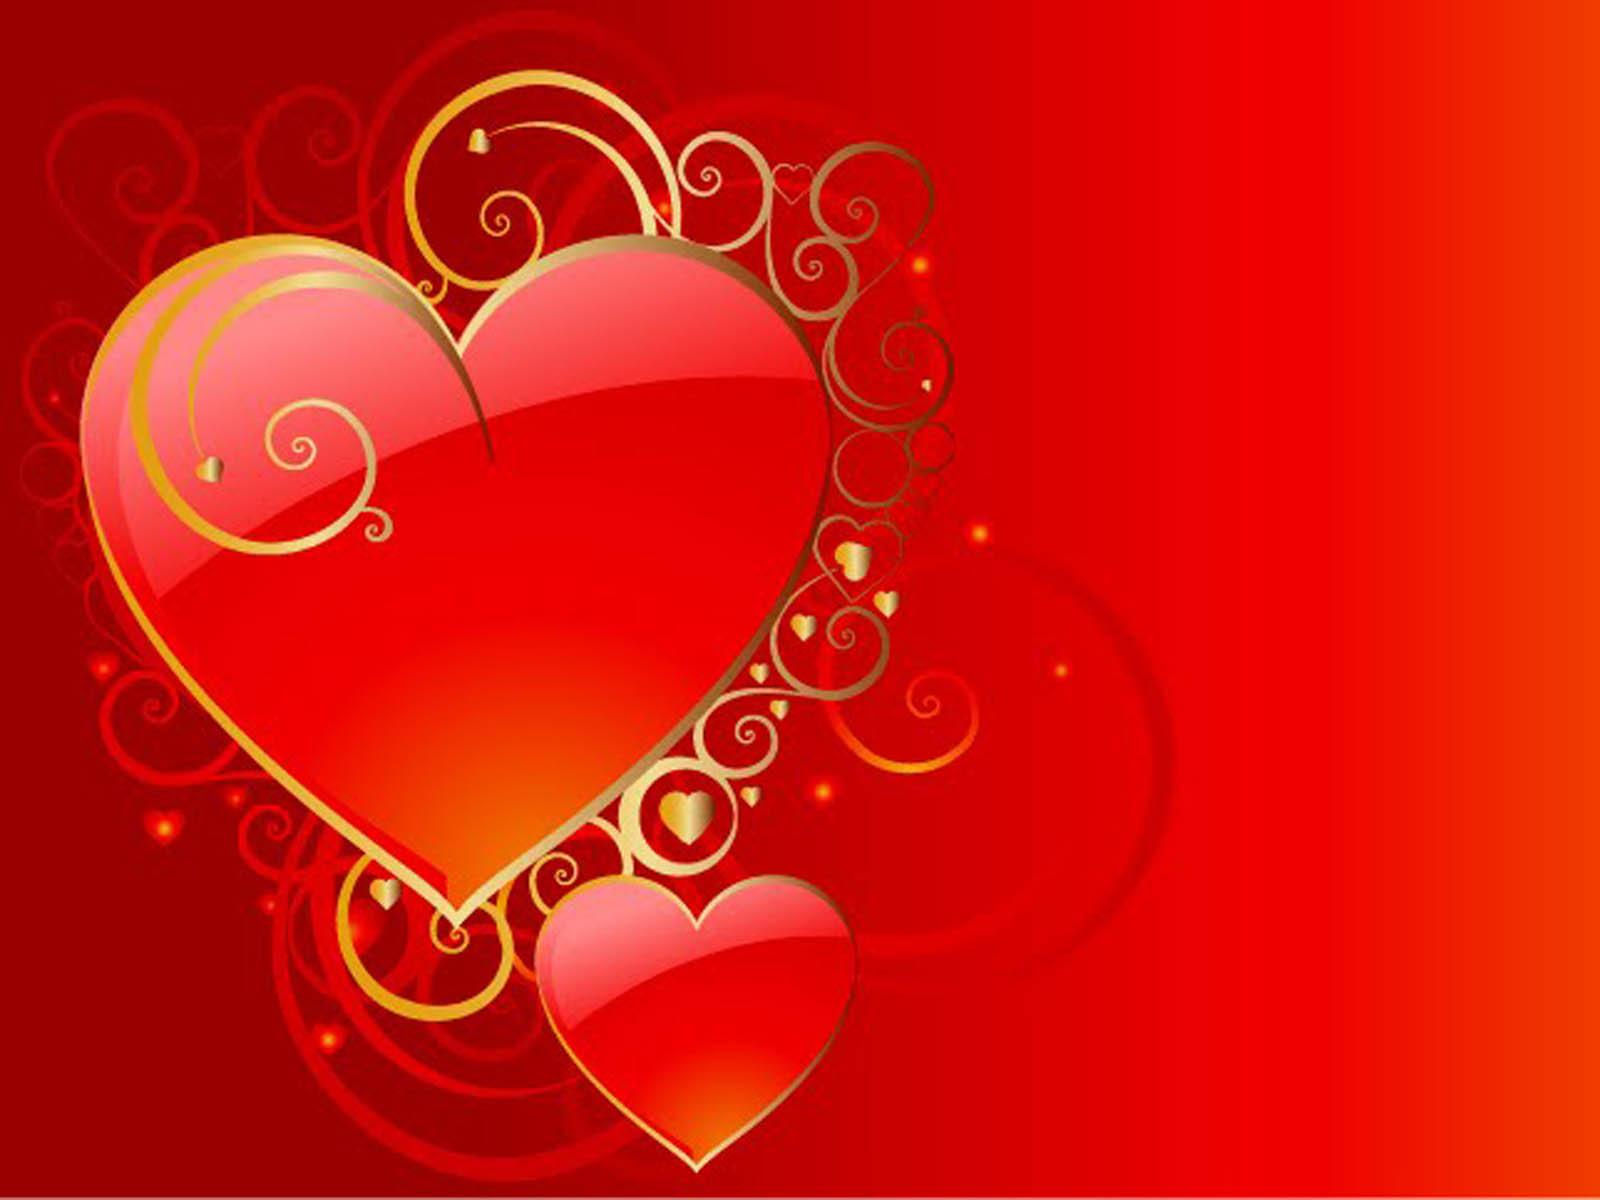 wallpaper: Love Heart Wallpapers